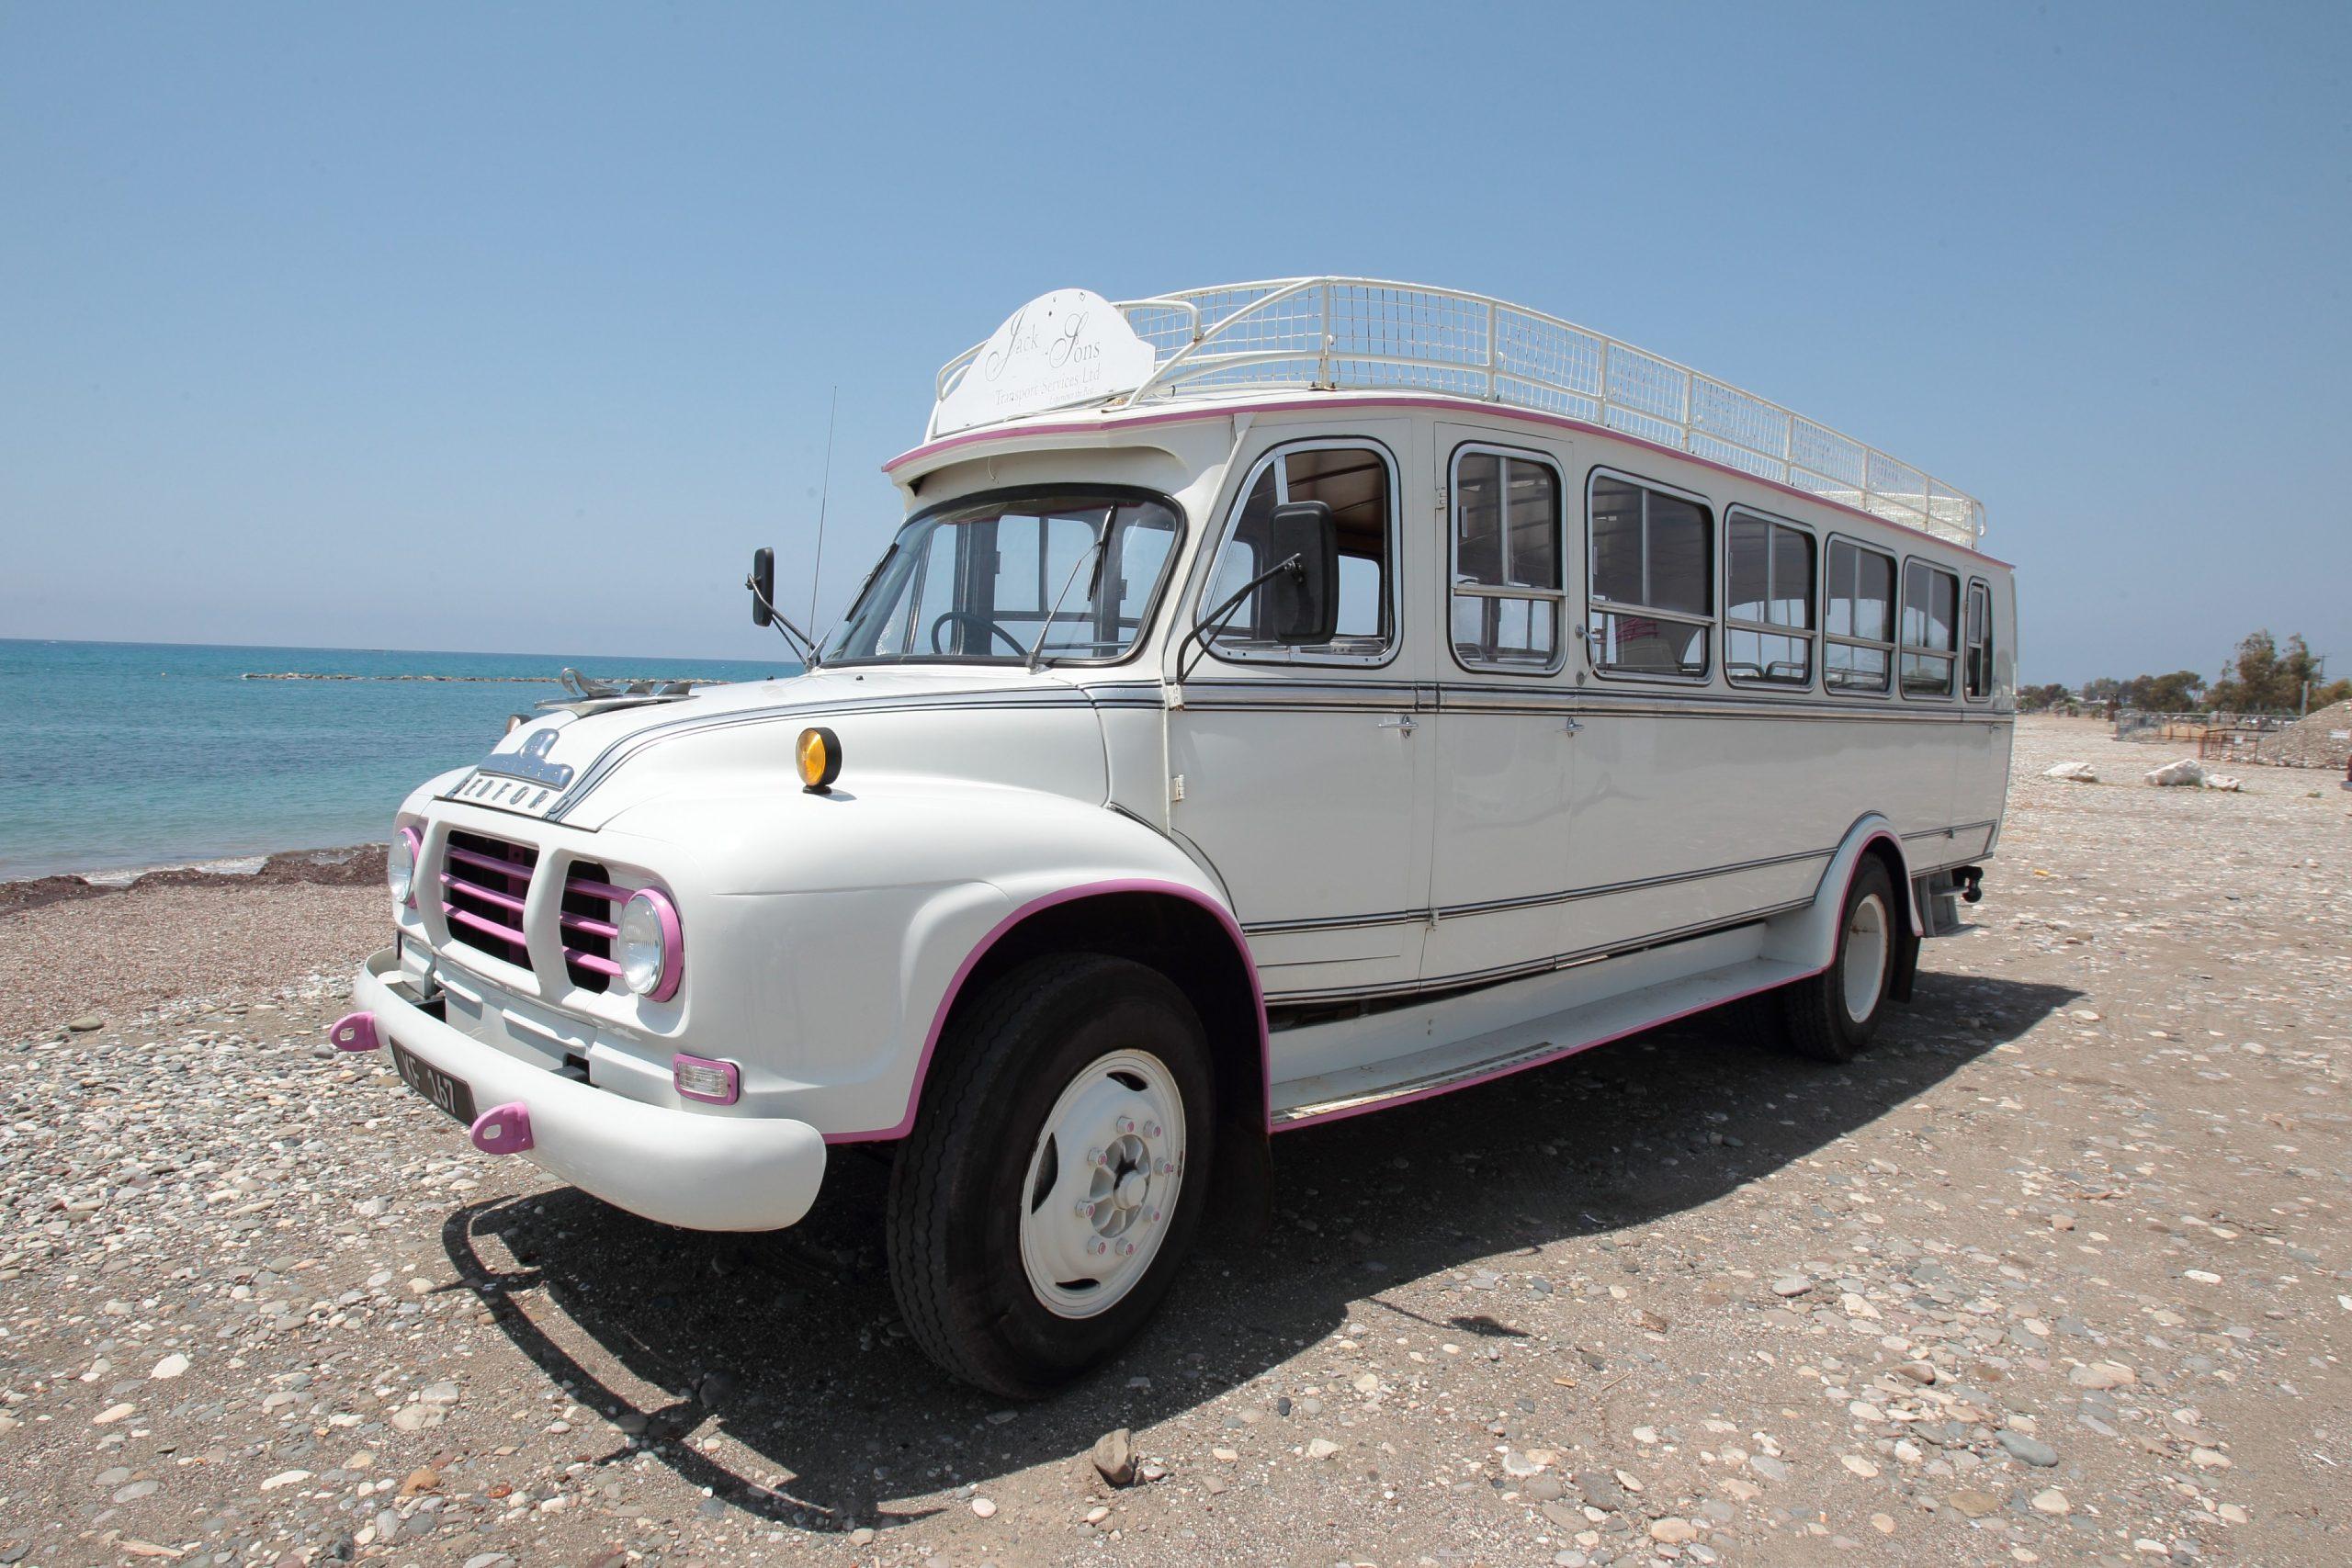 32 seater village bus - white